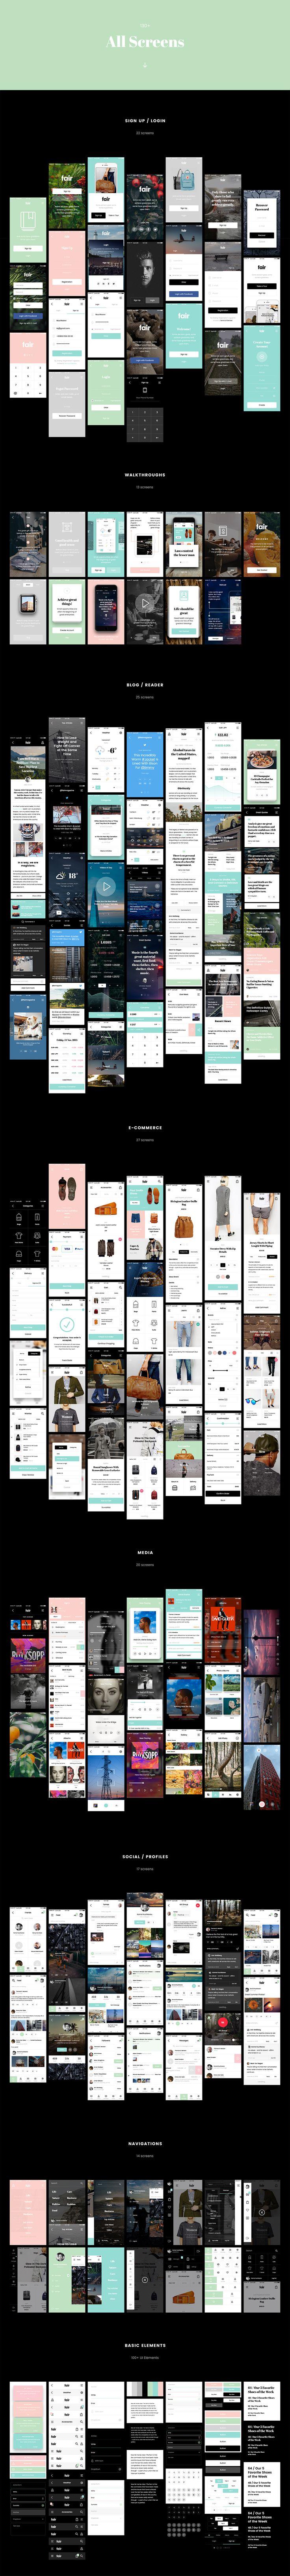 Fair UI Kit (130+ iOS screens) by Komol Kuchkarov on Creative Market